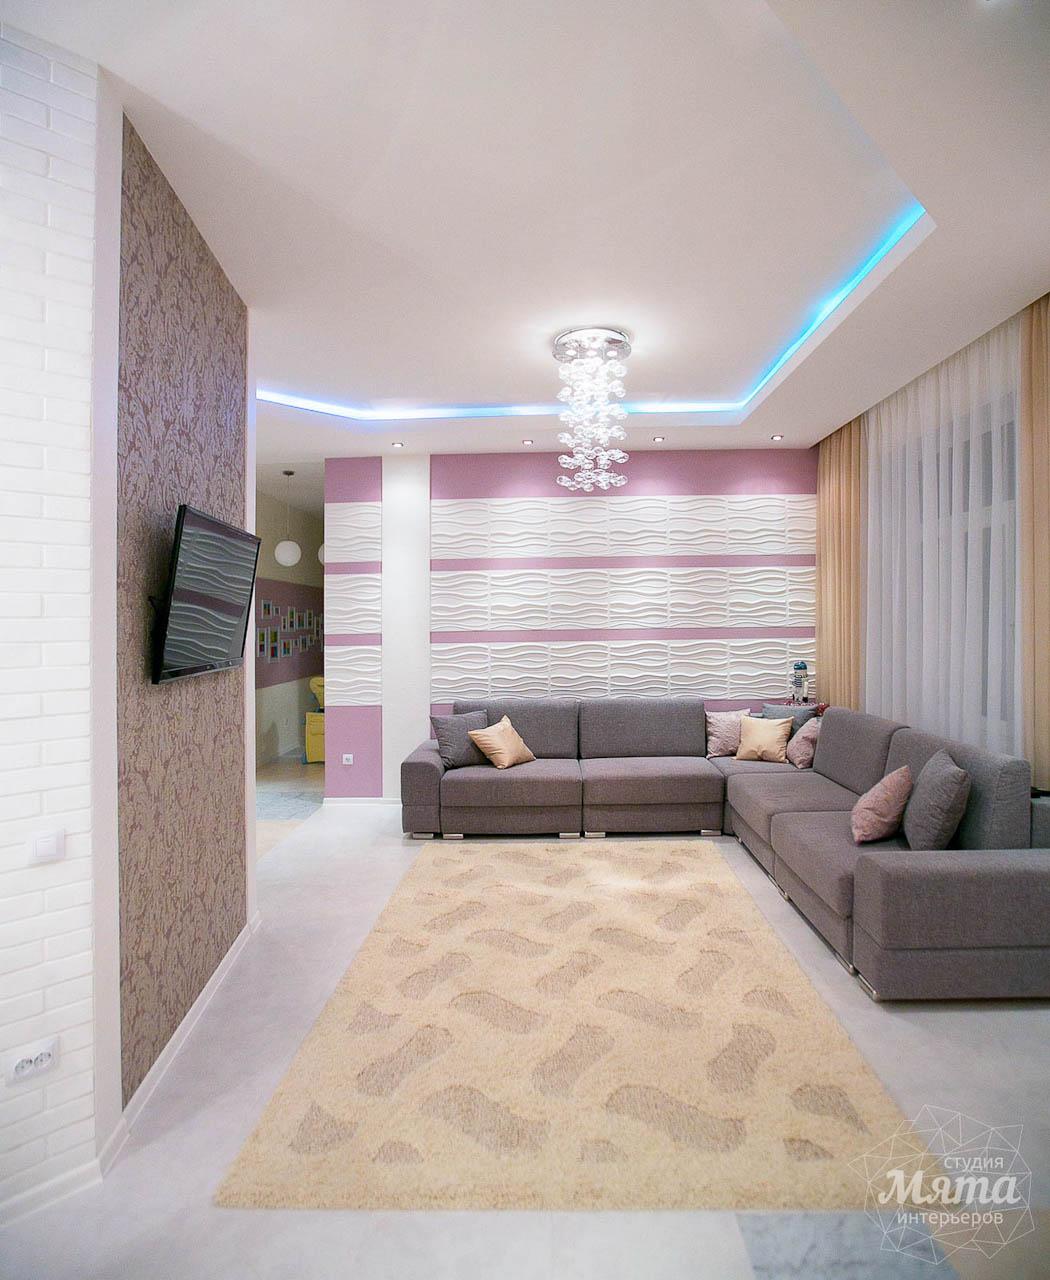 Дизайн интерьера и ремонт трехкомнатной квартиры по ул. Чкалова 124 8